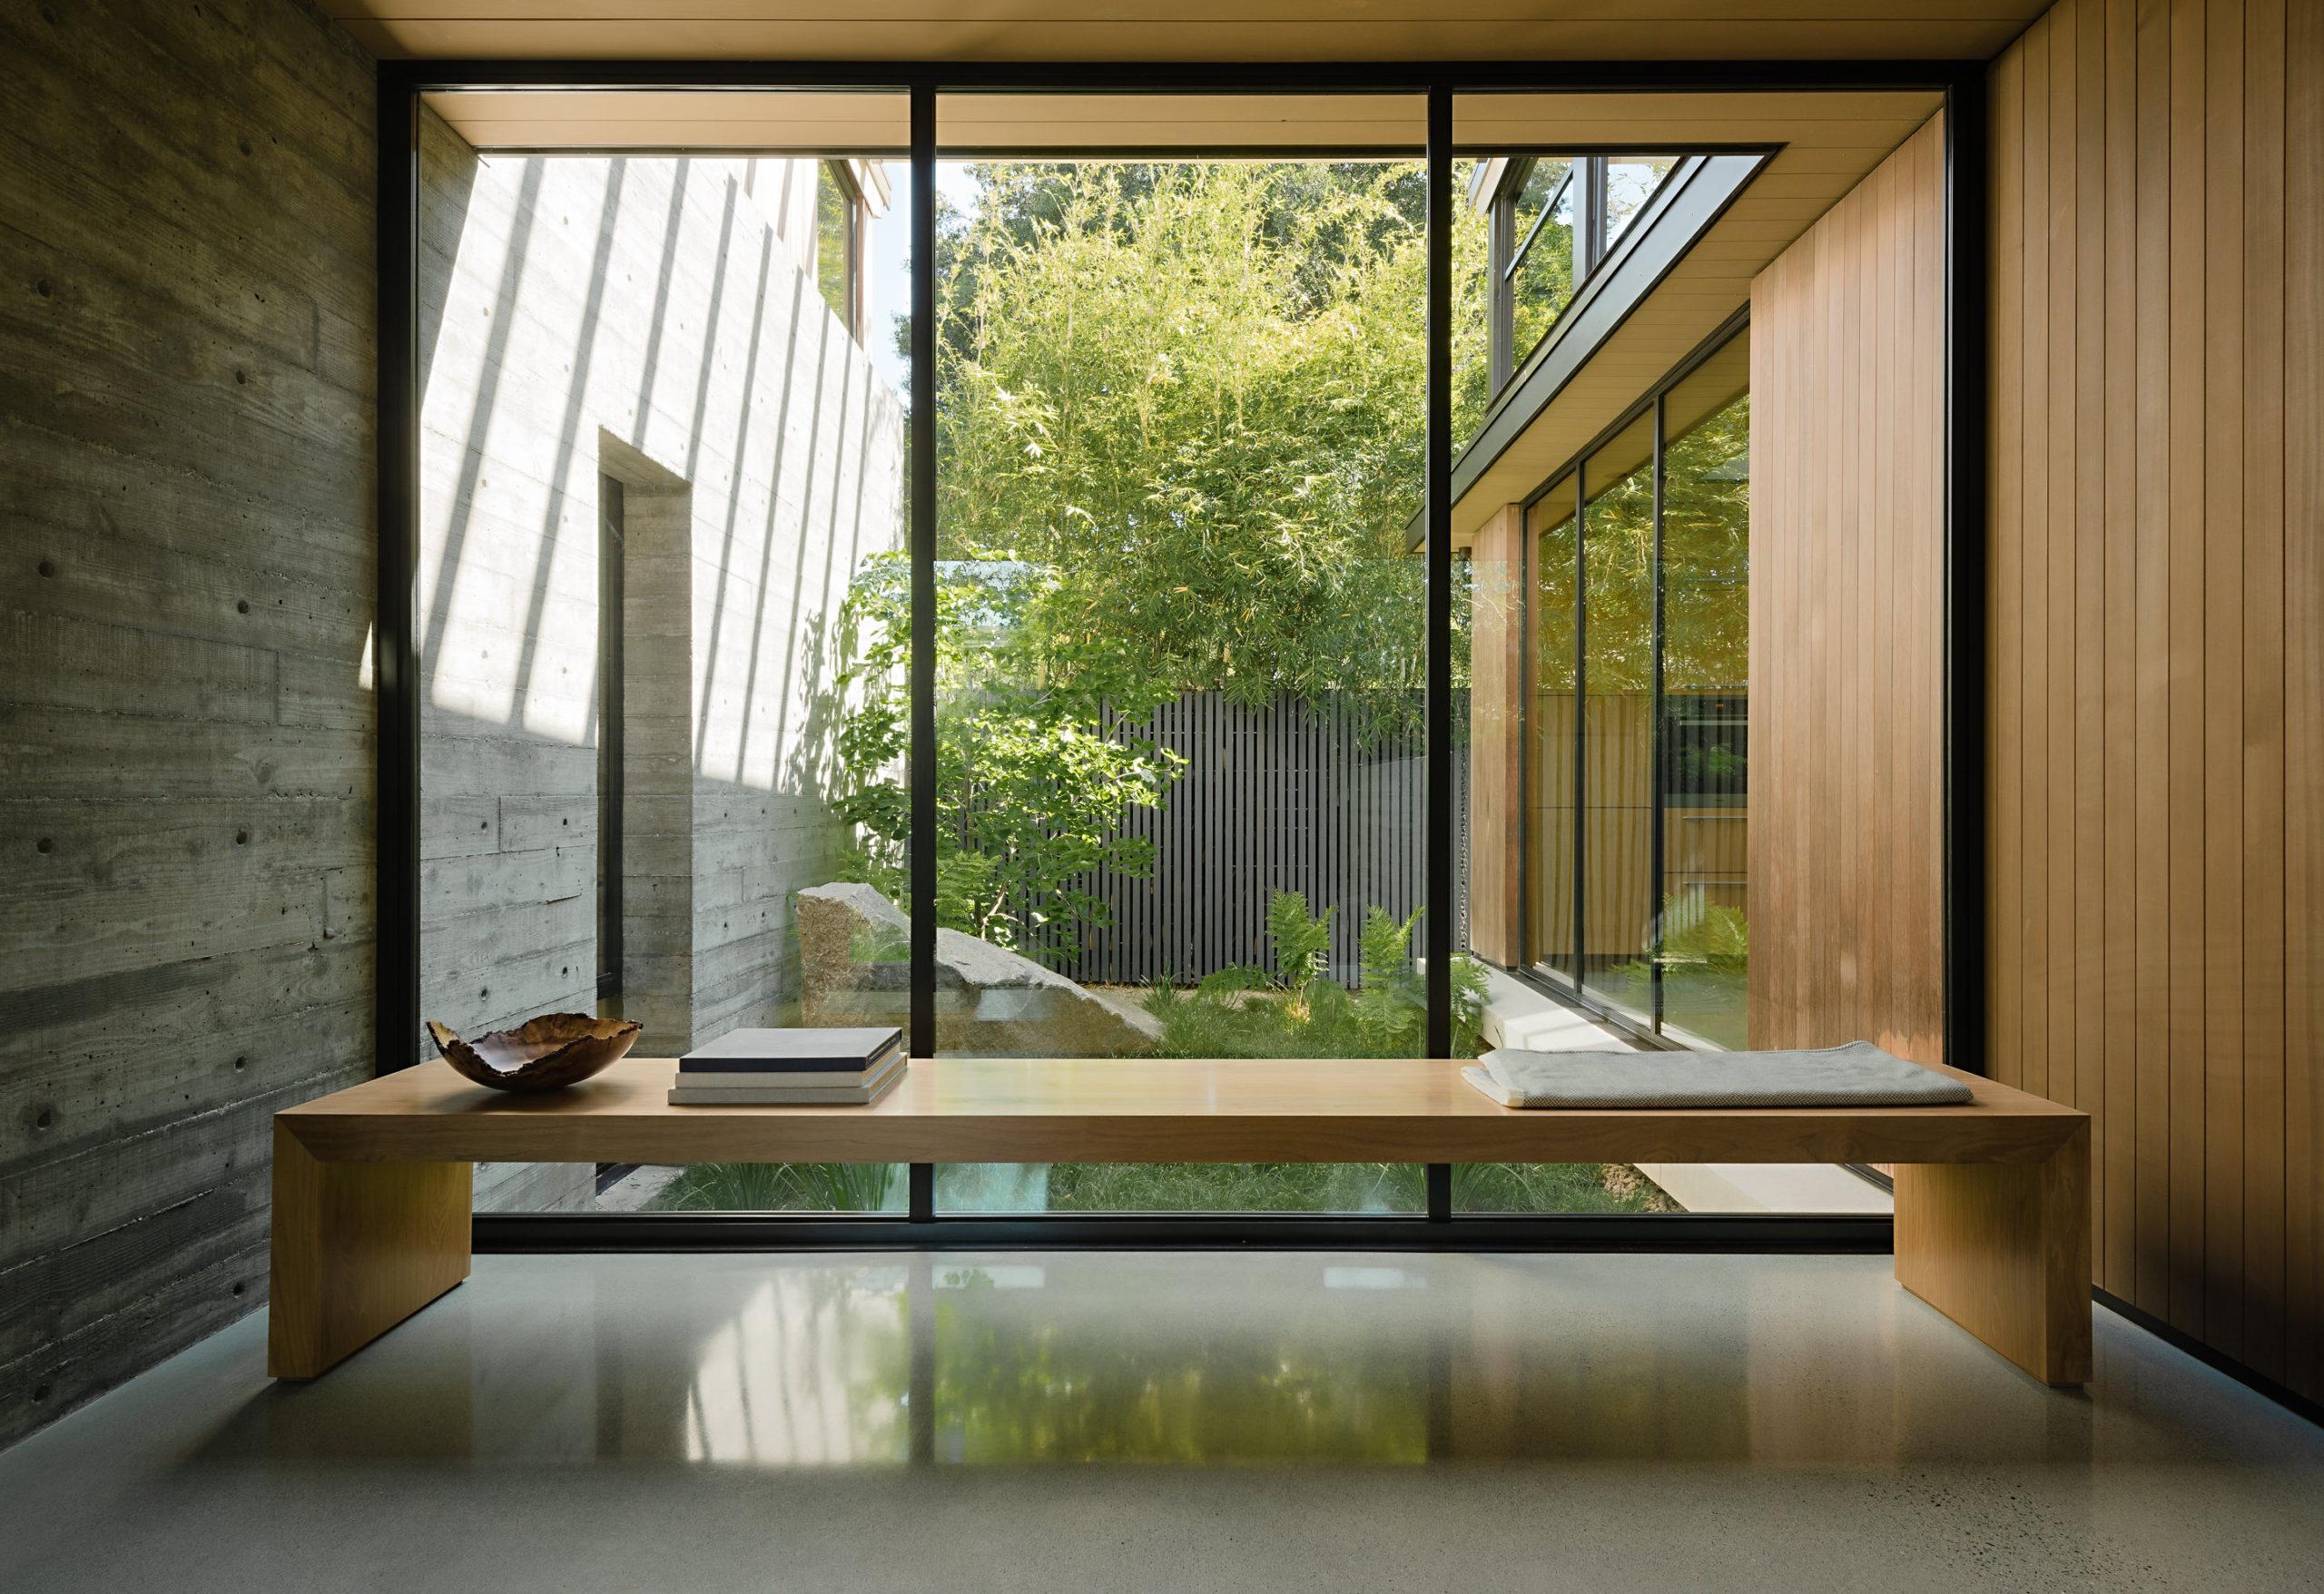 est living the sanctuary feldman architecutre 5 scaled